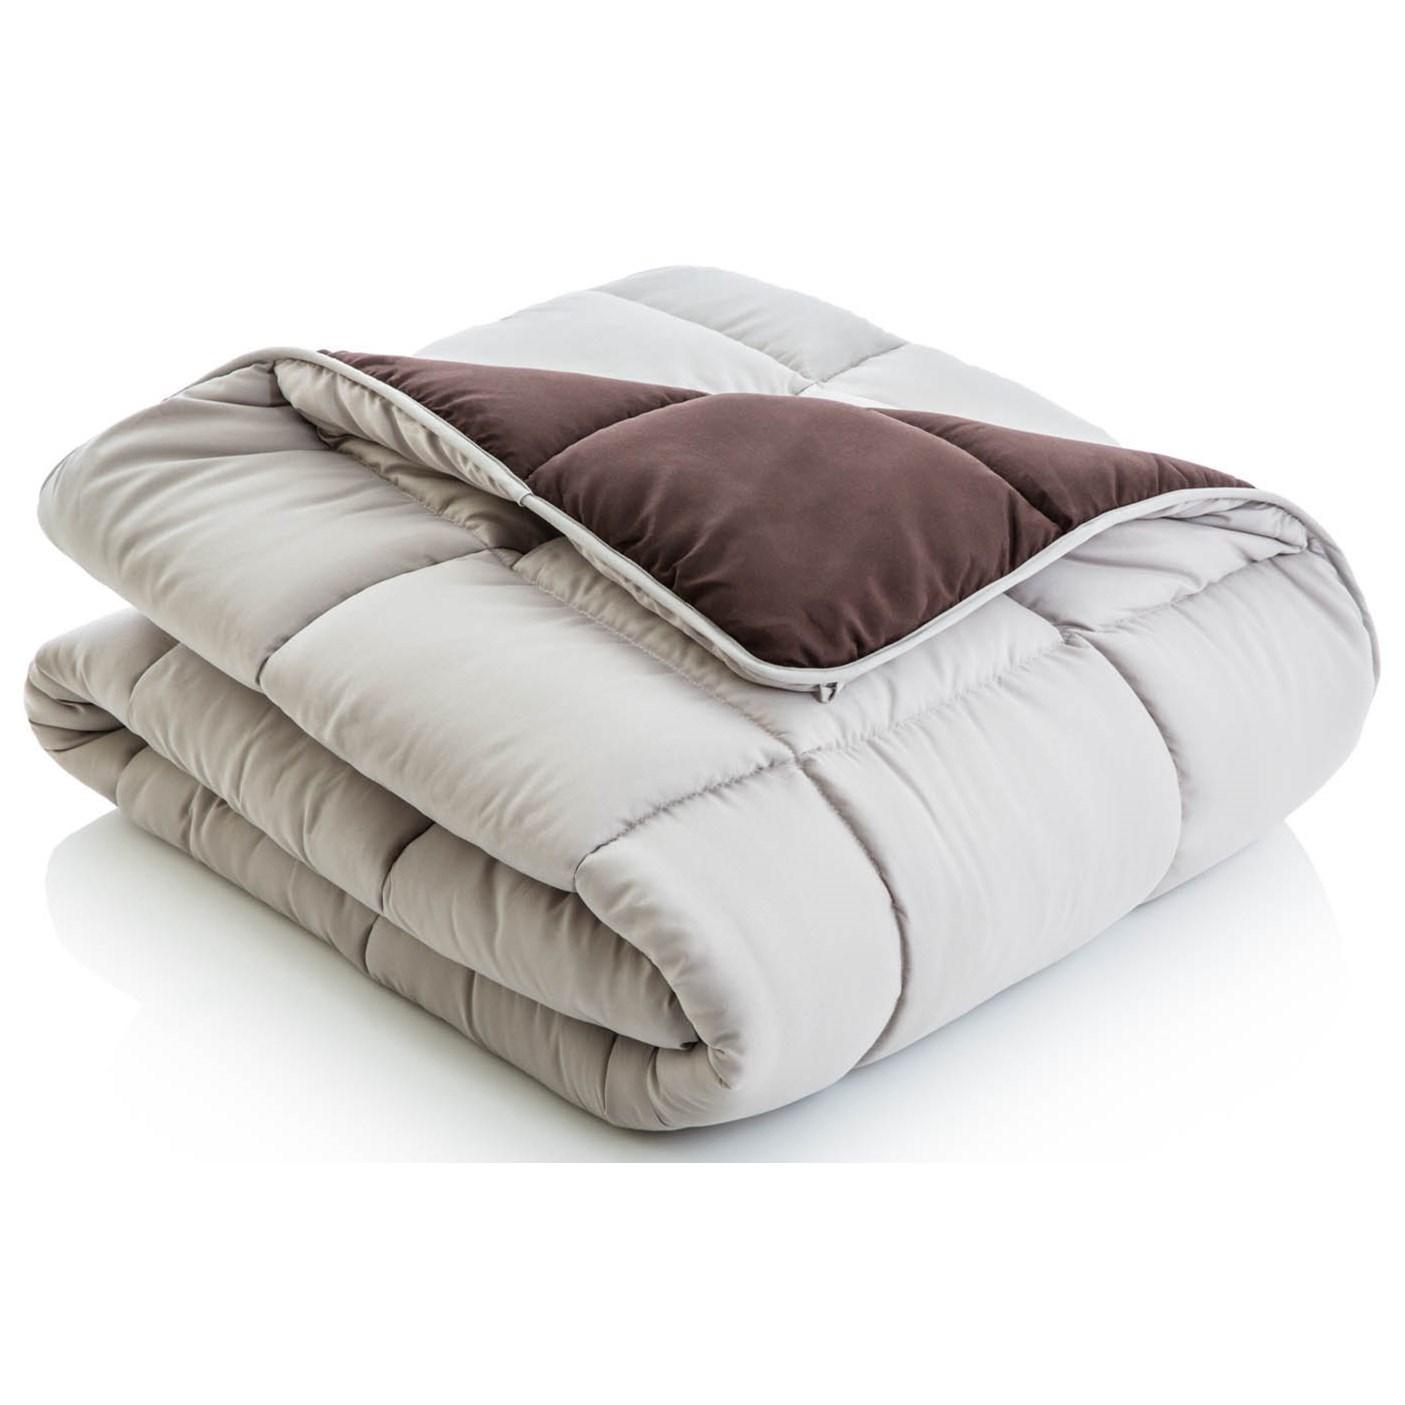 Malouf Reversible Bed in a Bag Split Queen Reversible Bed in a Bag - Item Number: MA01SQDRCOBB